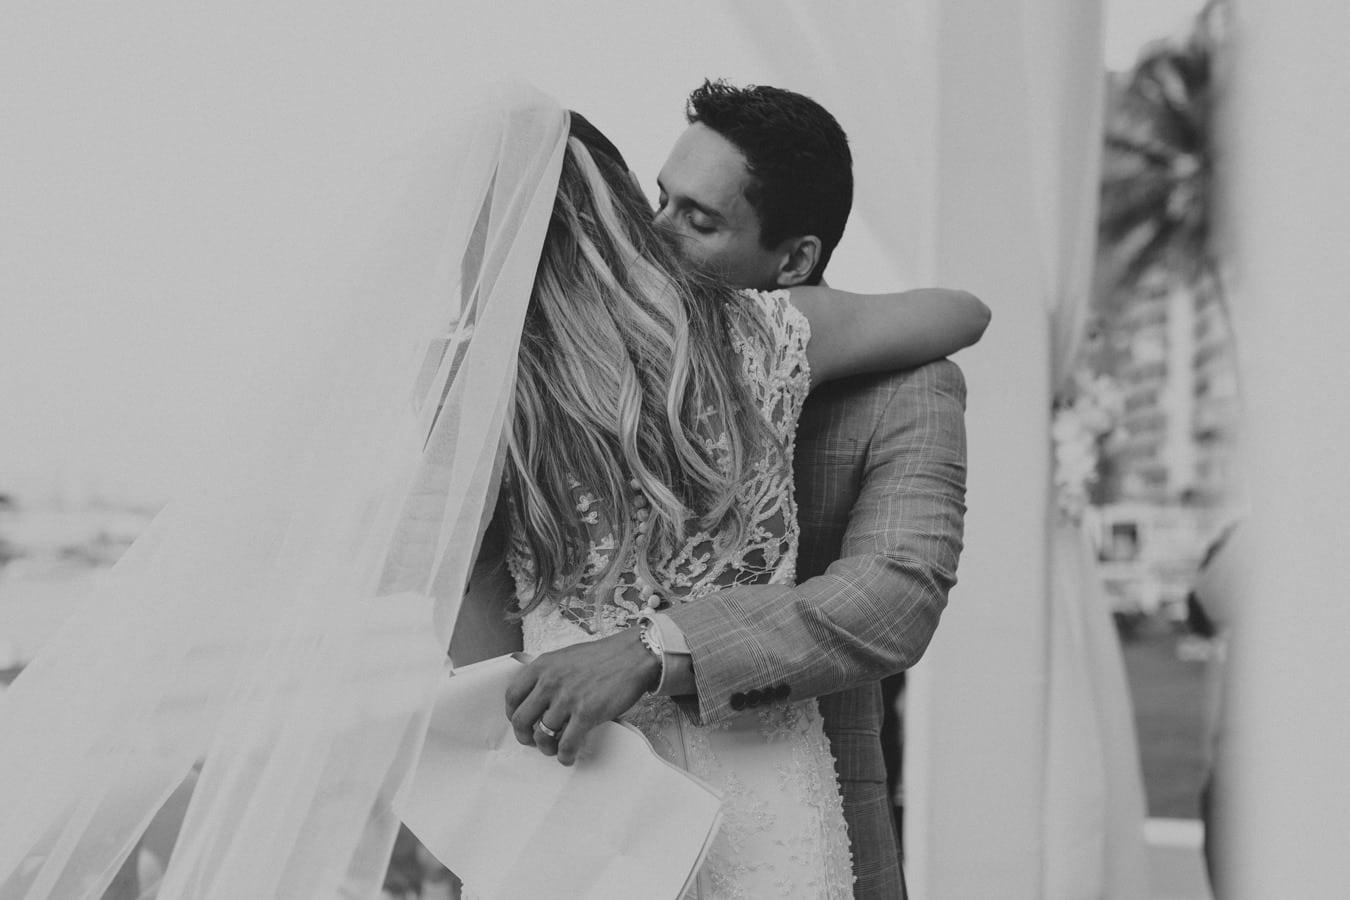 Cerimonia de Fotos de Casamento no Iate Clube de Fortaleza